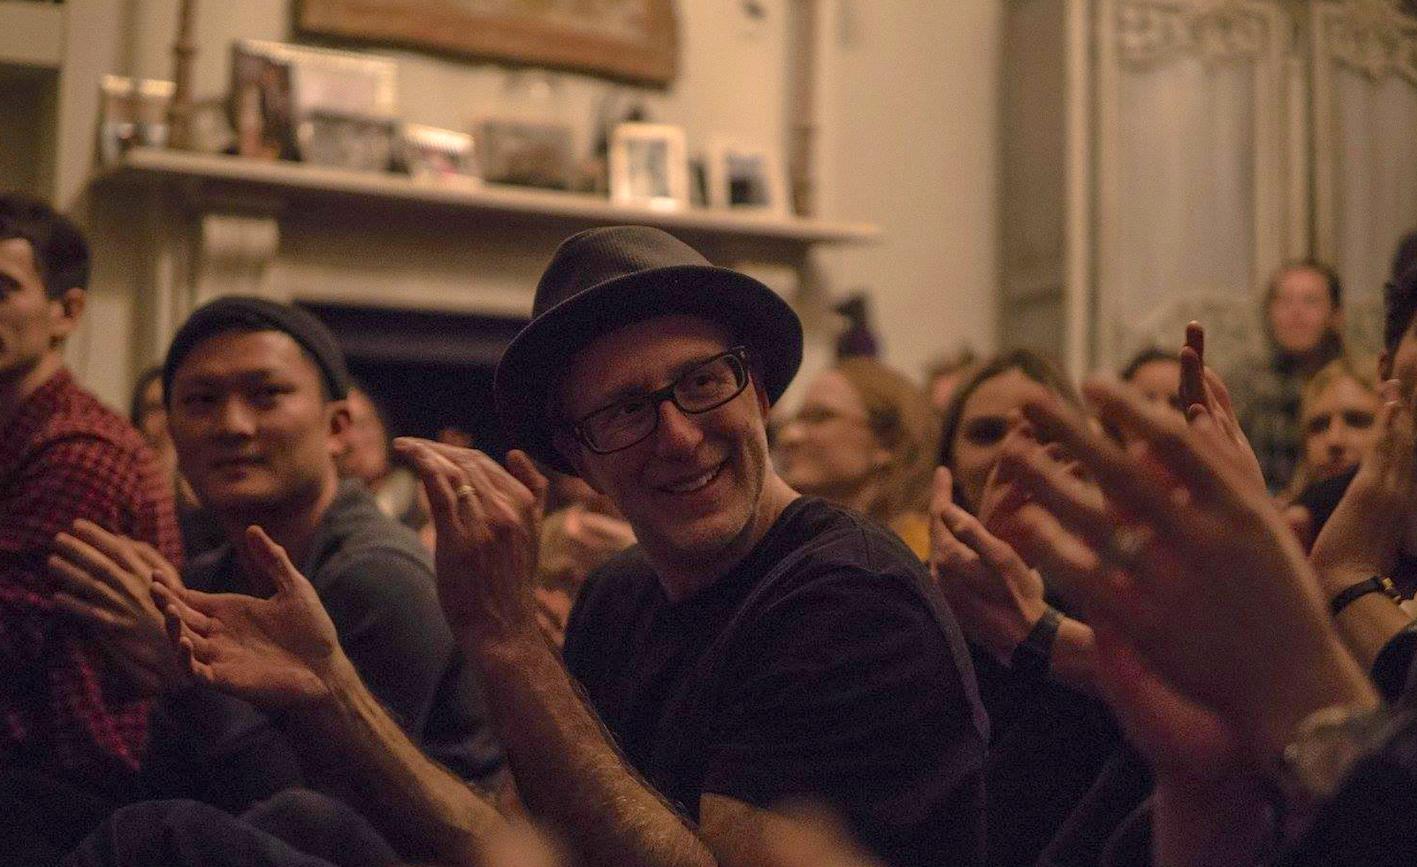 Rafe Offer at a Sofar Sounds gig. Photo: Ryan Bound